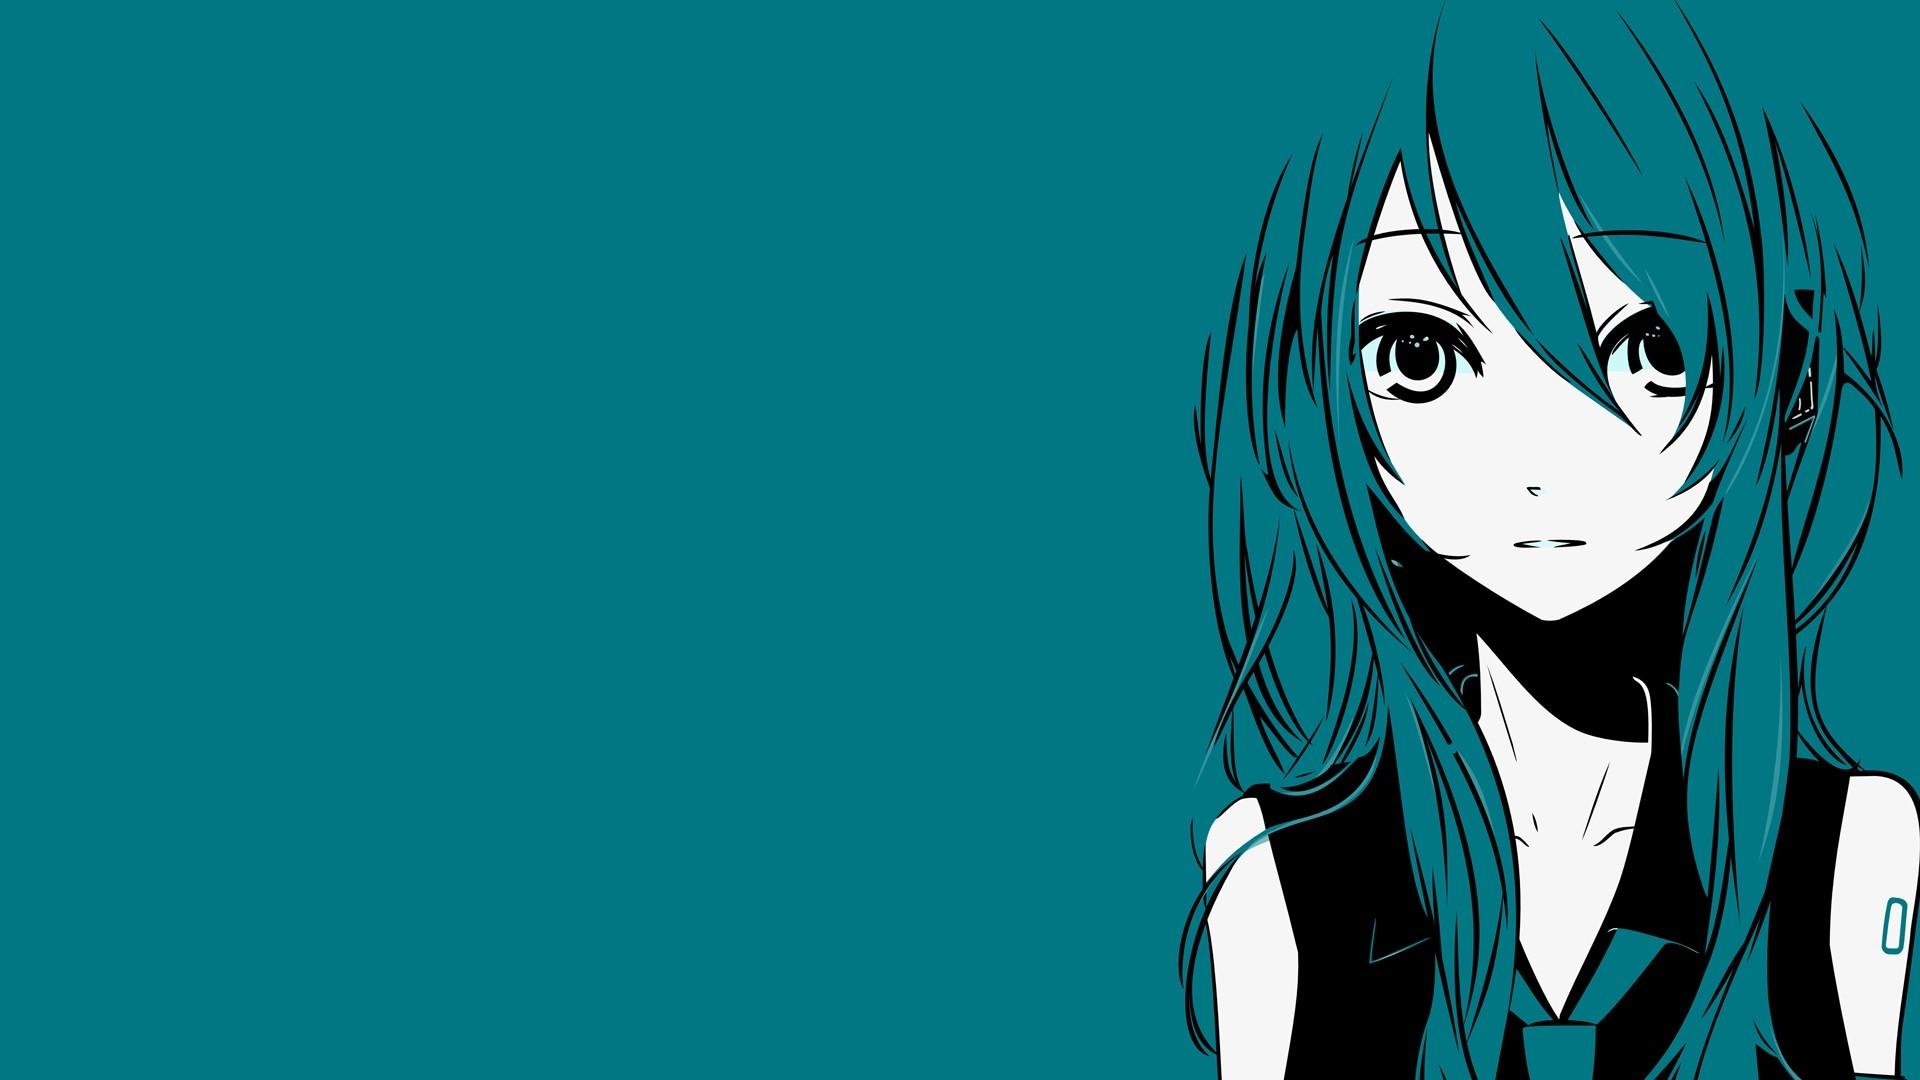 Anime Hatsune Miku Minimalistic Full HD Desktop Wallpapers 1080p 1920x1080